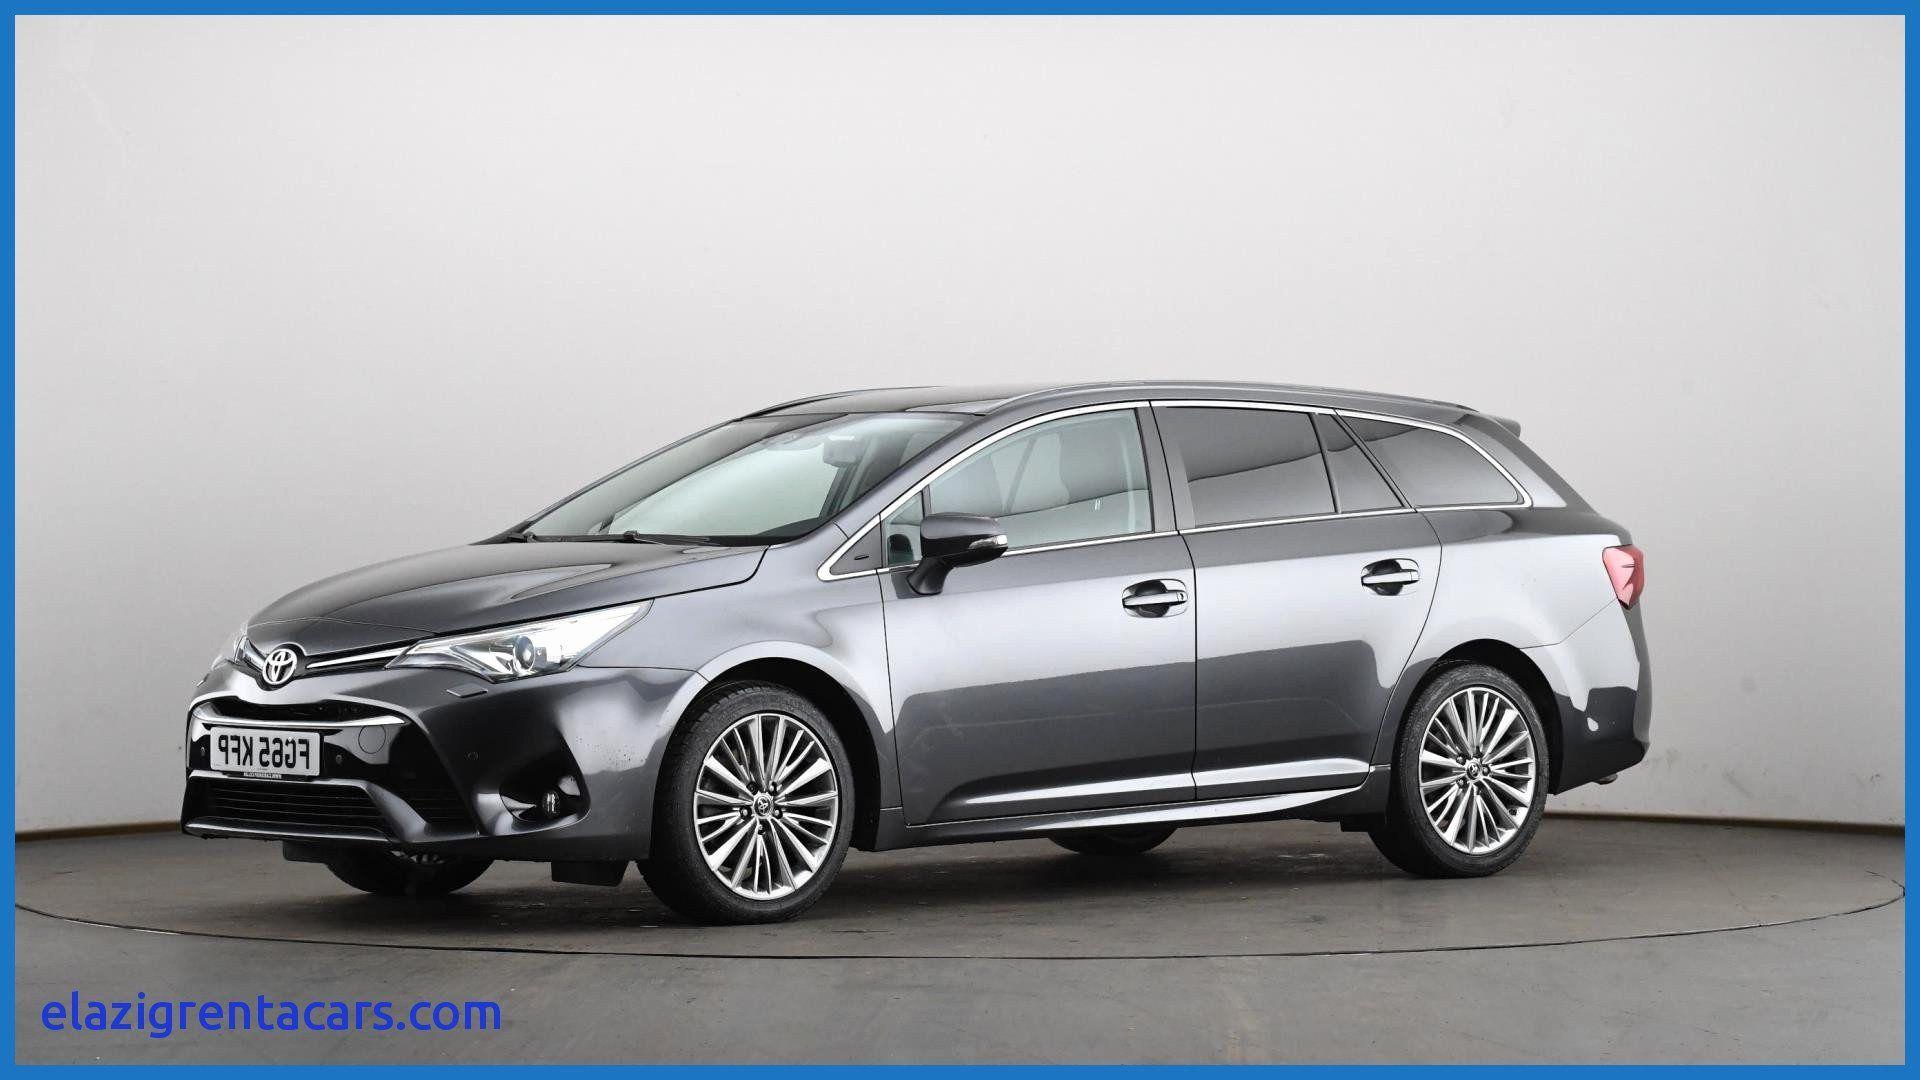 2021 Mazda Cx 3 Photos in 2020 Toyota, Toyota innova